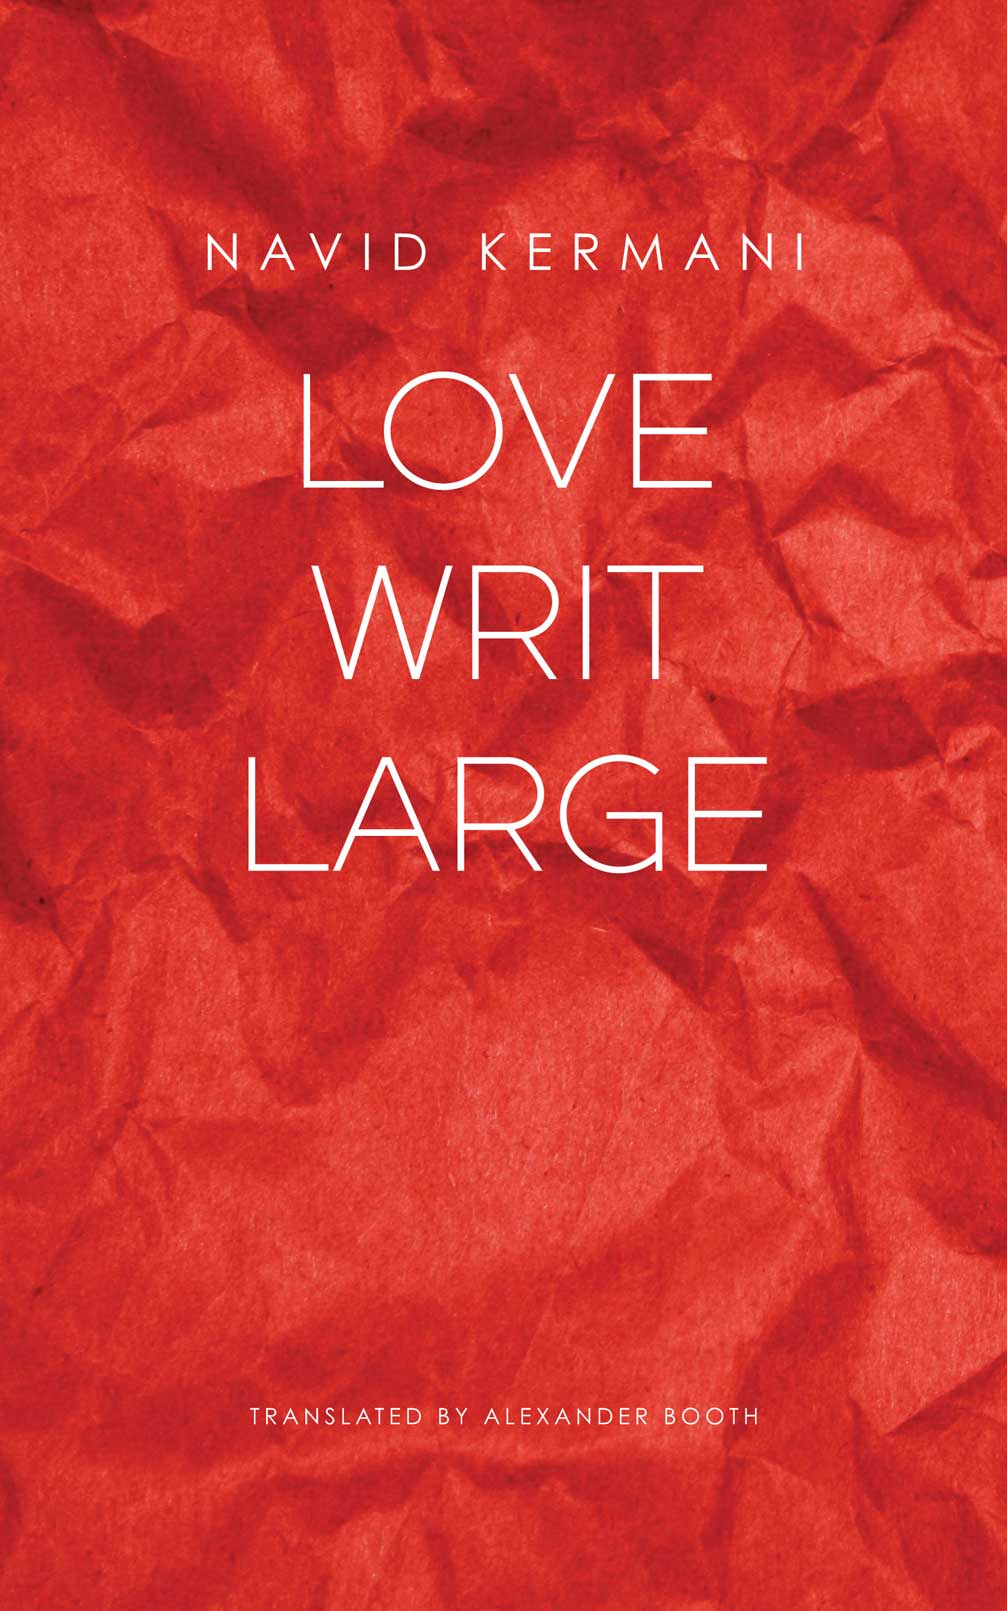 Love Writ Large by Navid Kermani | Seagull Books